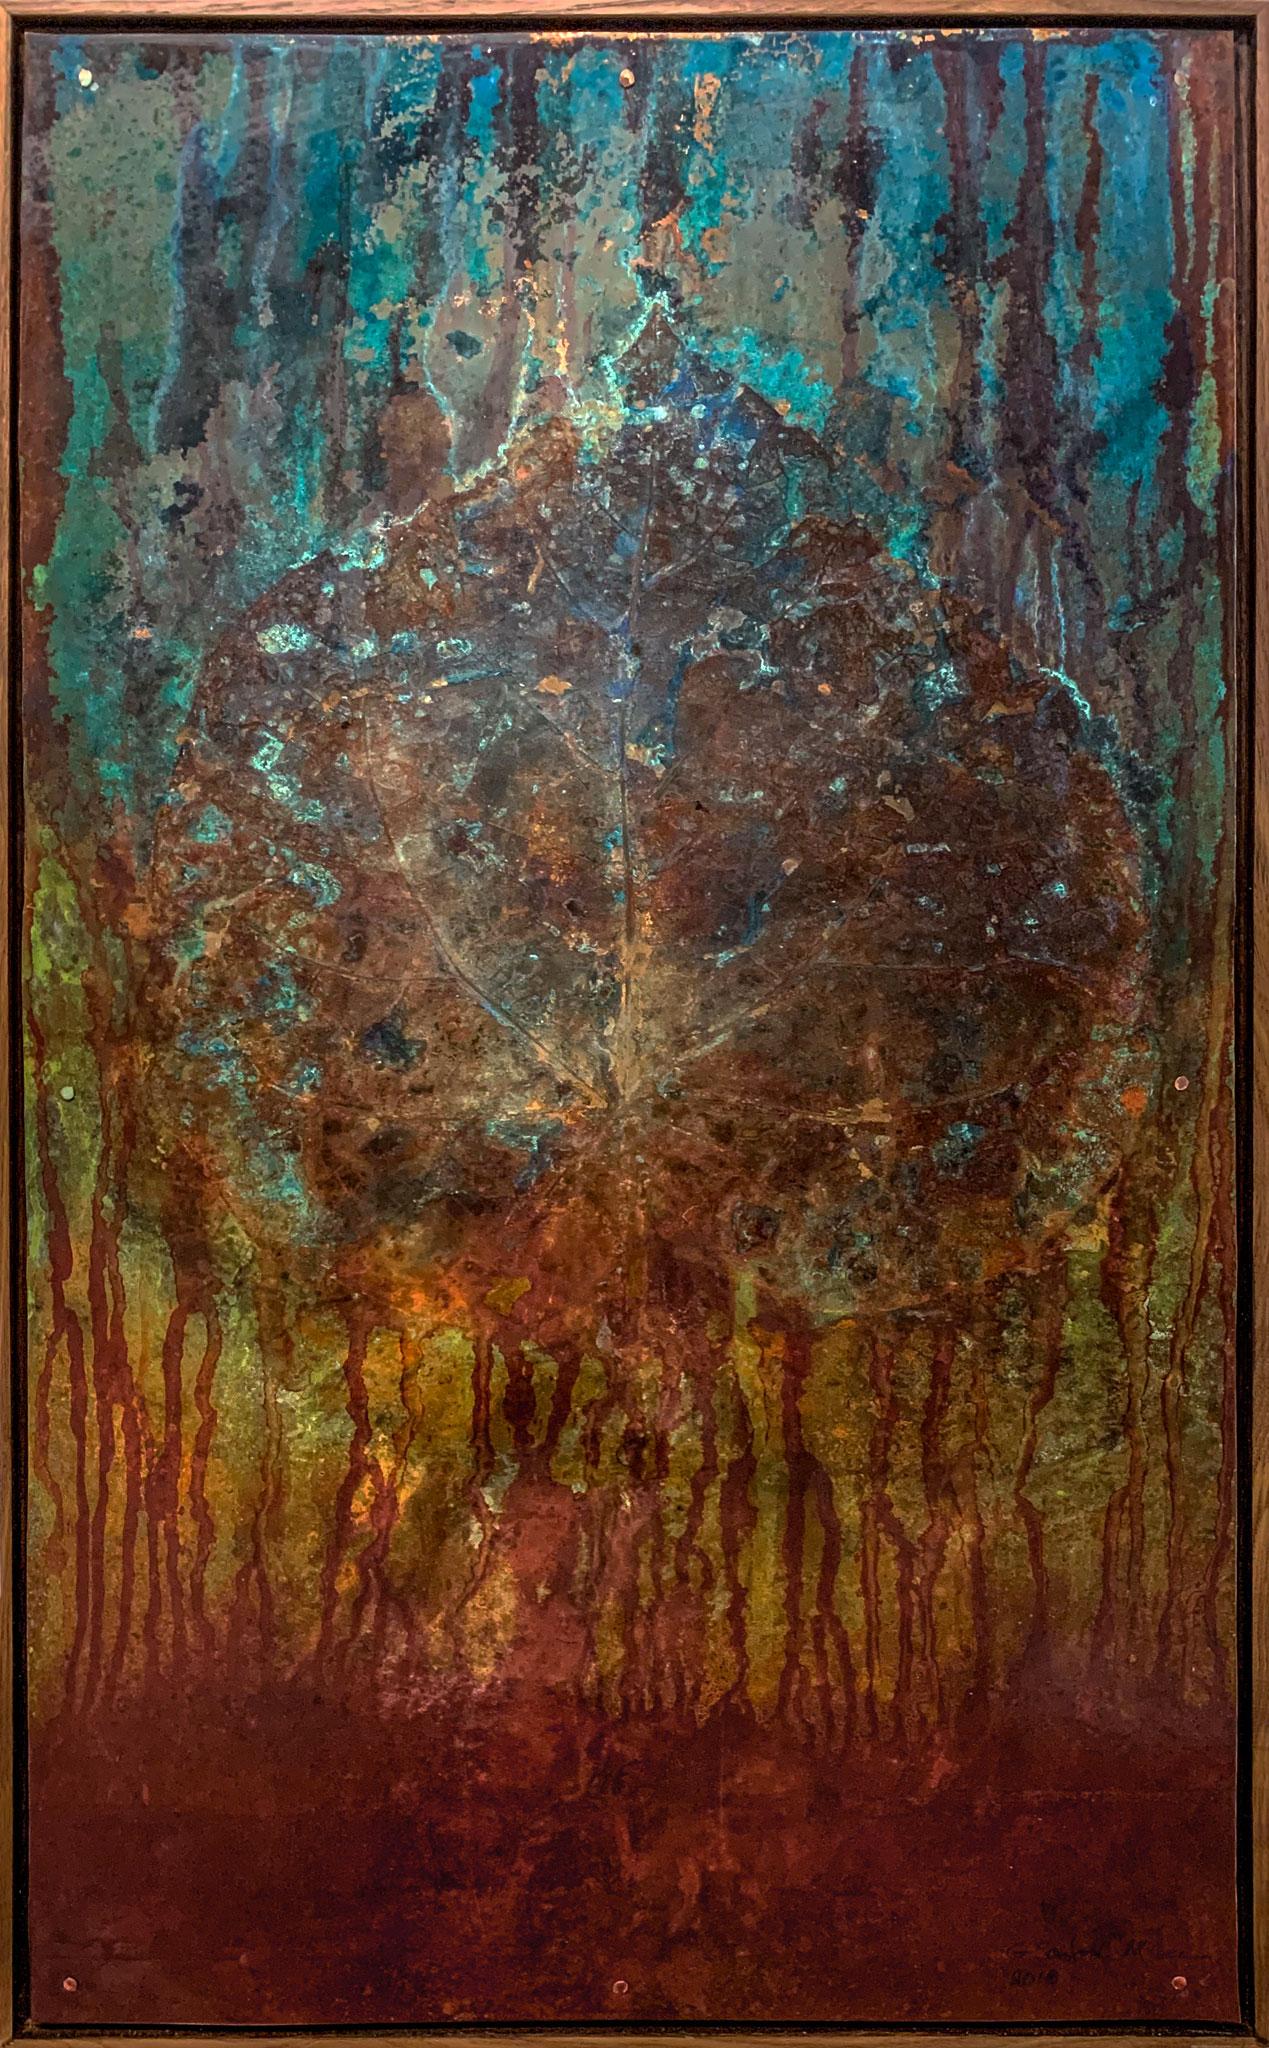 sanford-mcgee-copper-art-tennessee-heart-leaf.jpg